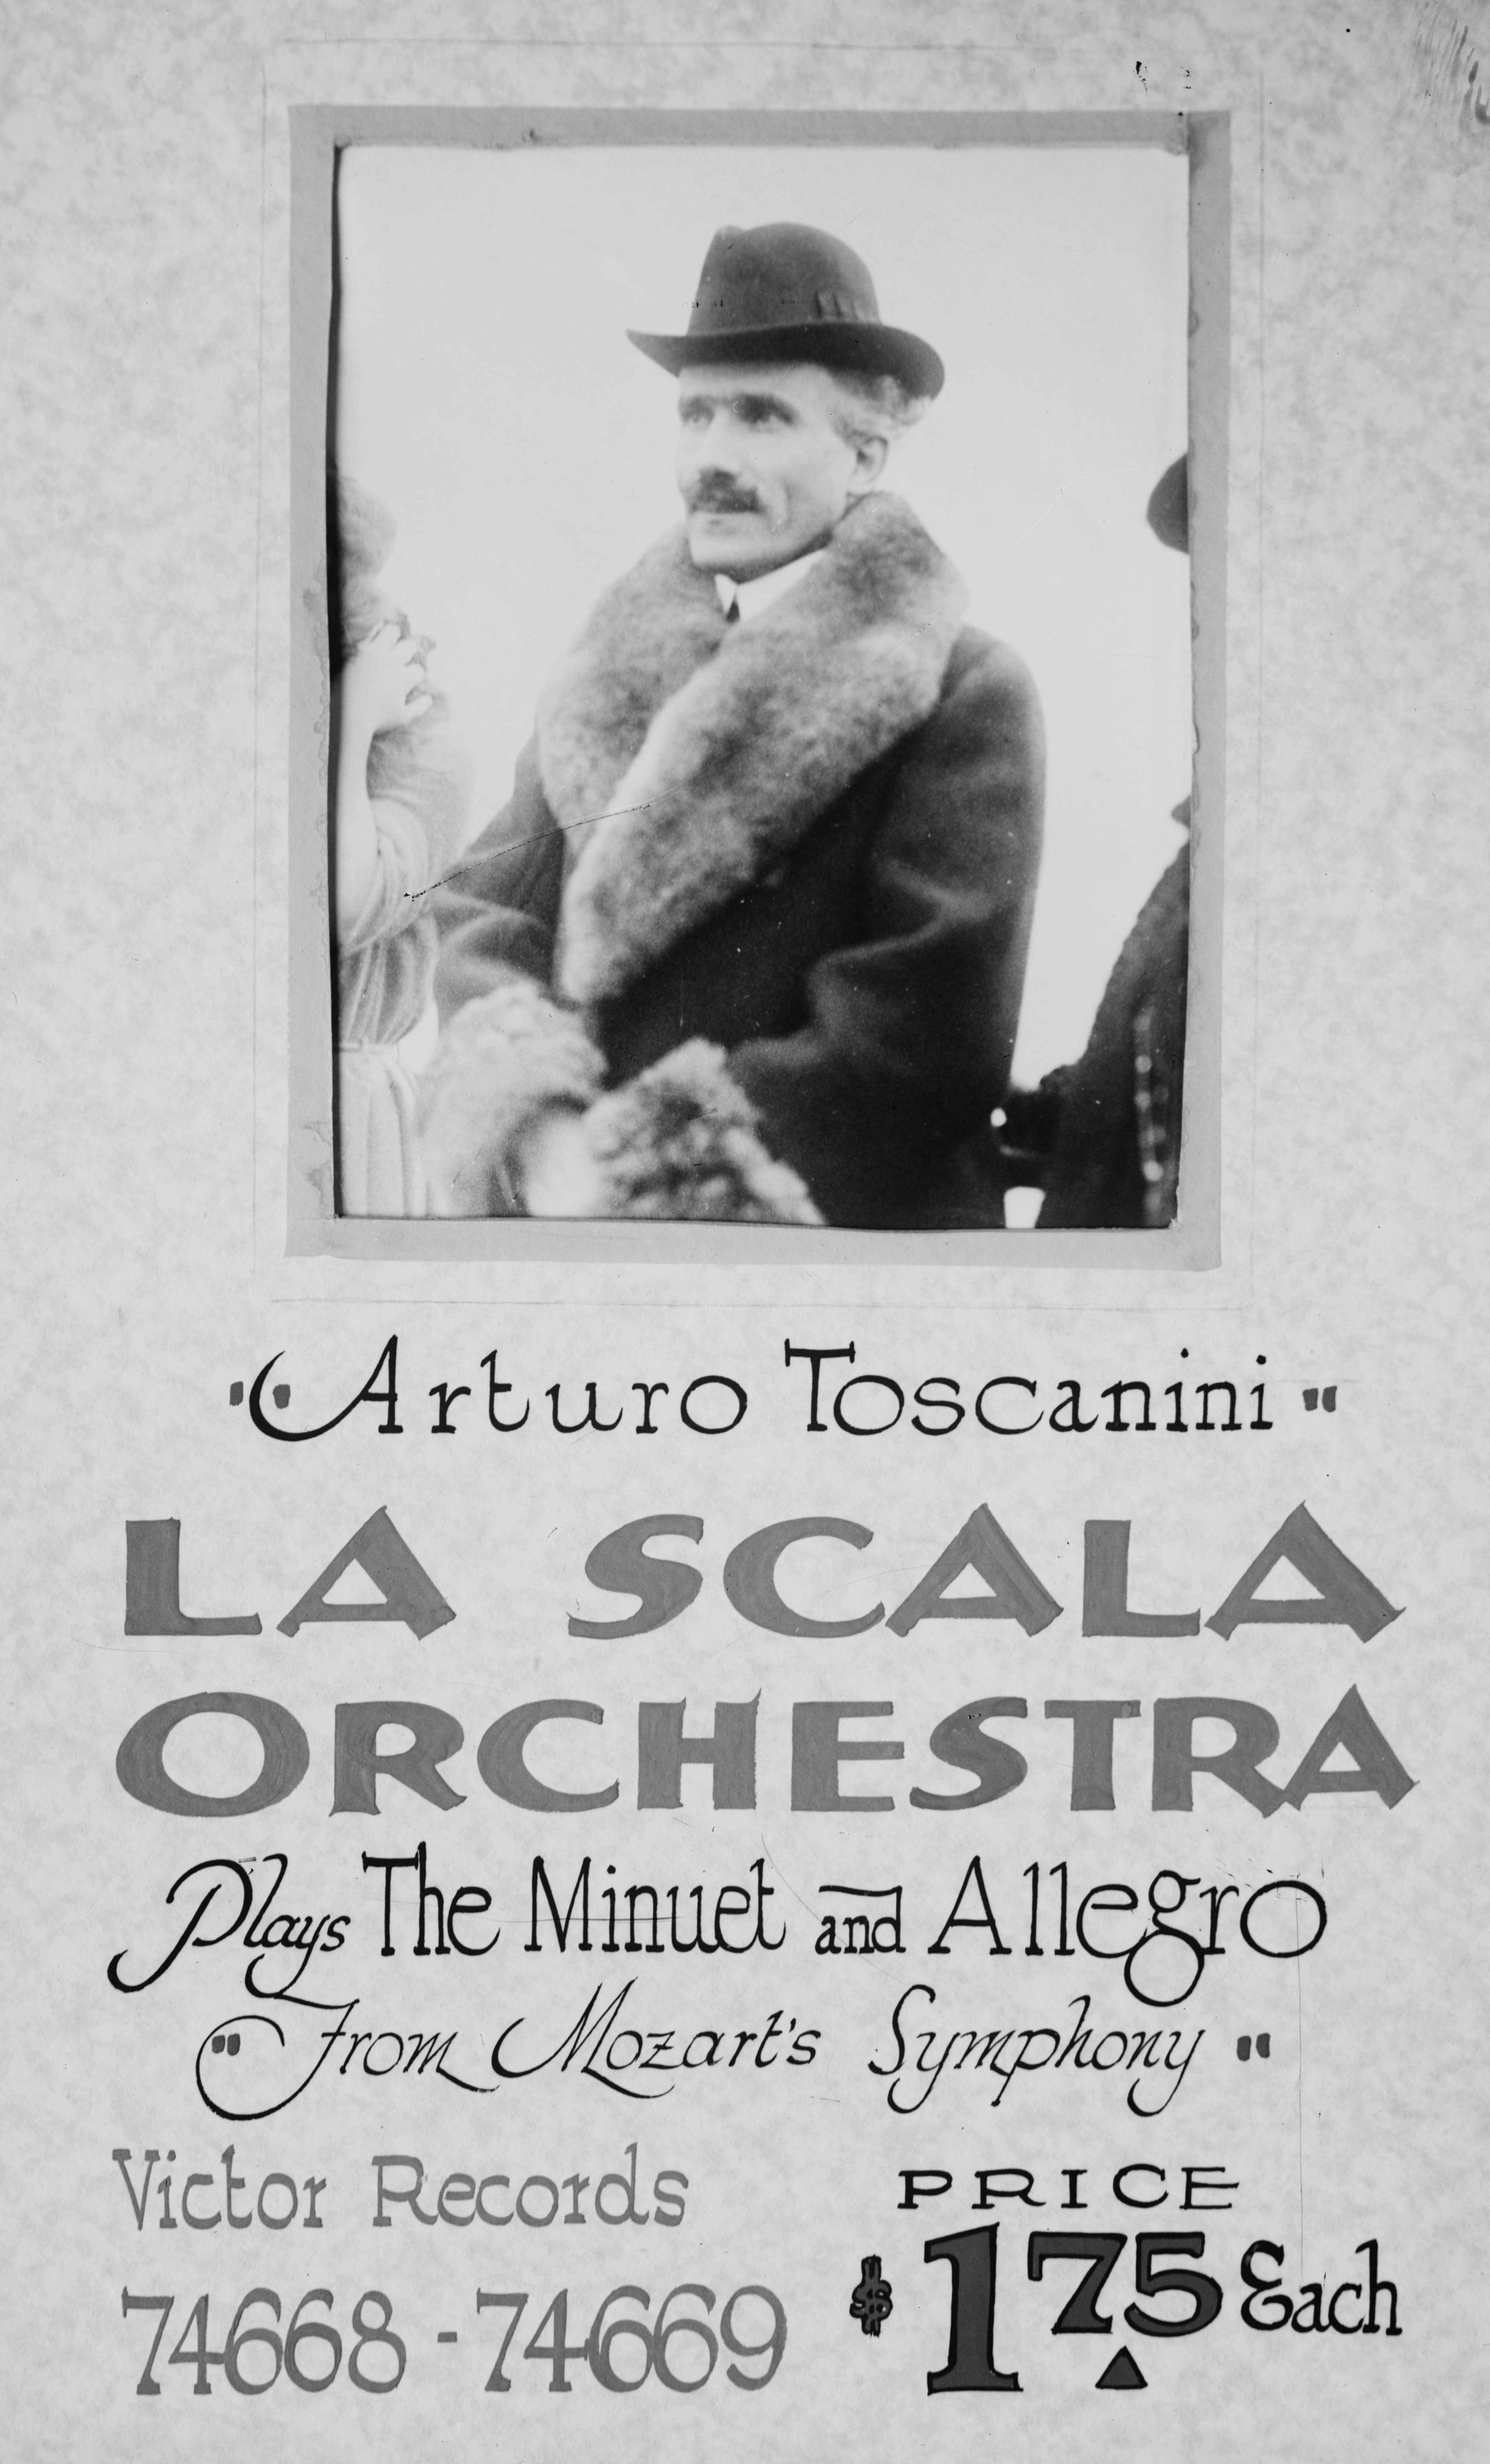 Arquivo: Toscanini poster.jpg